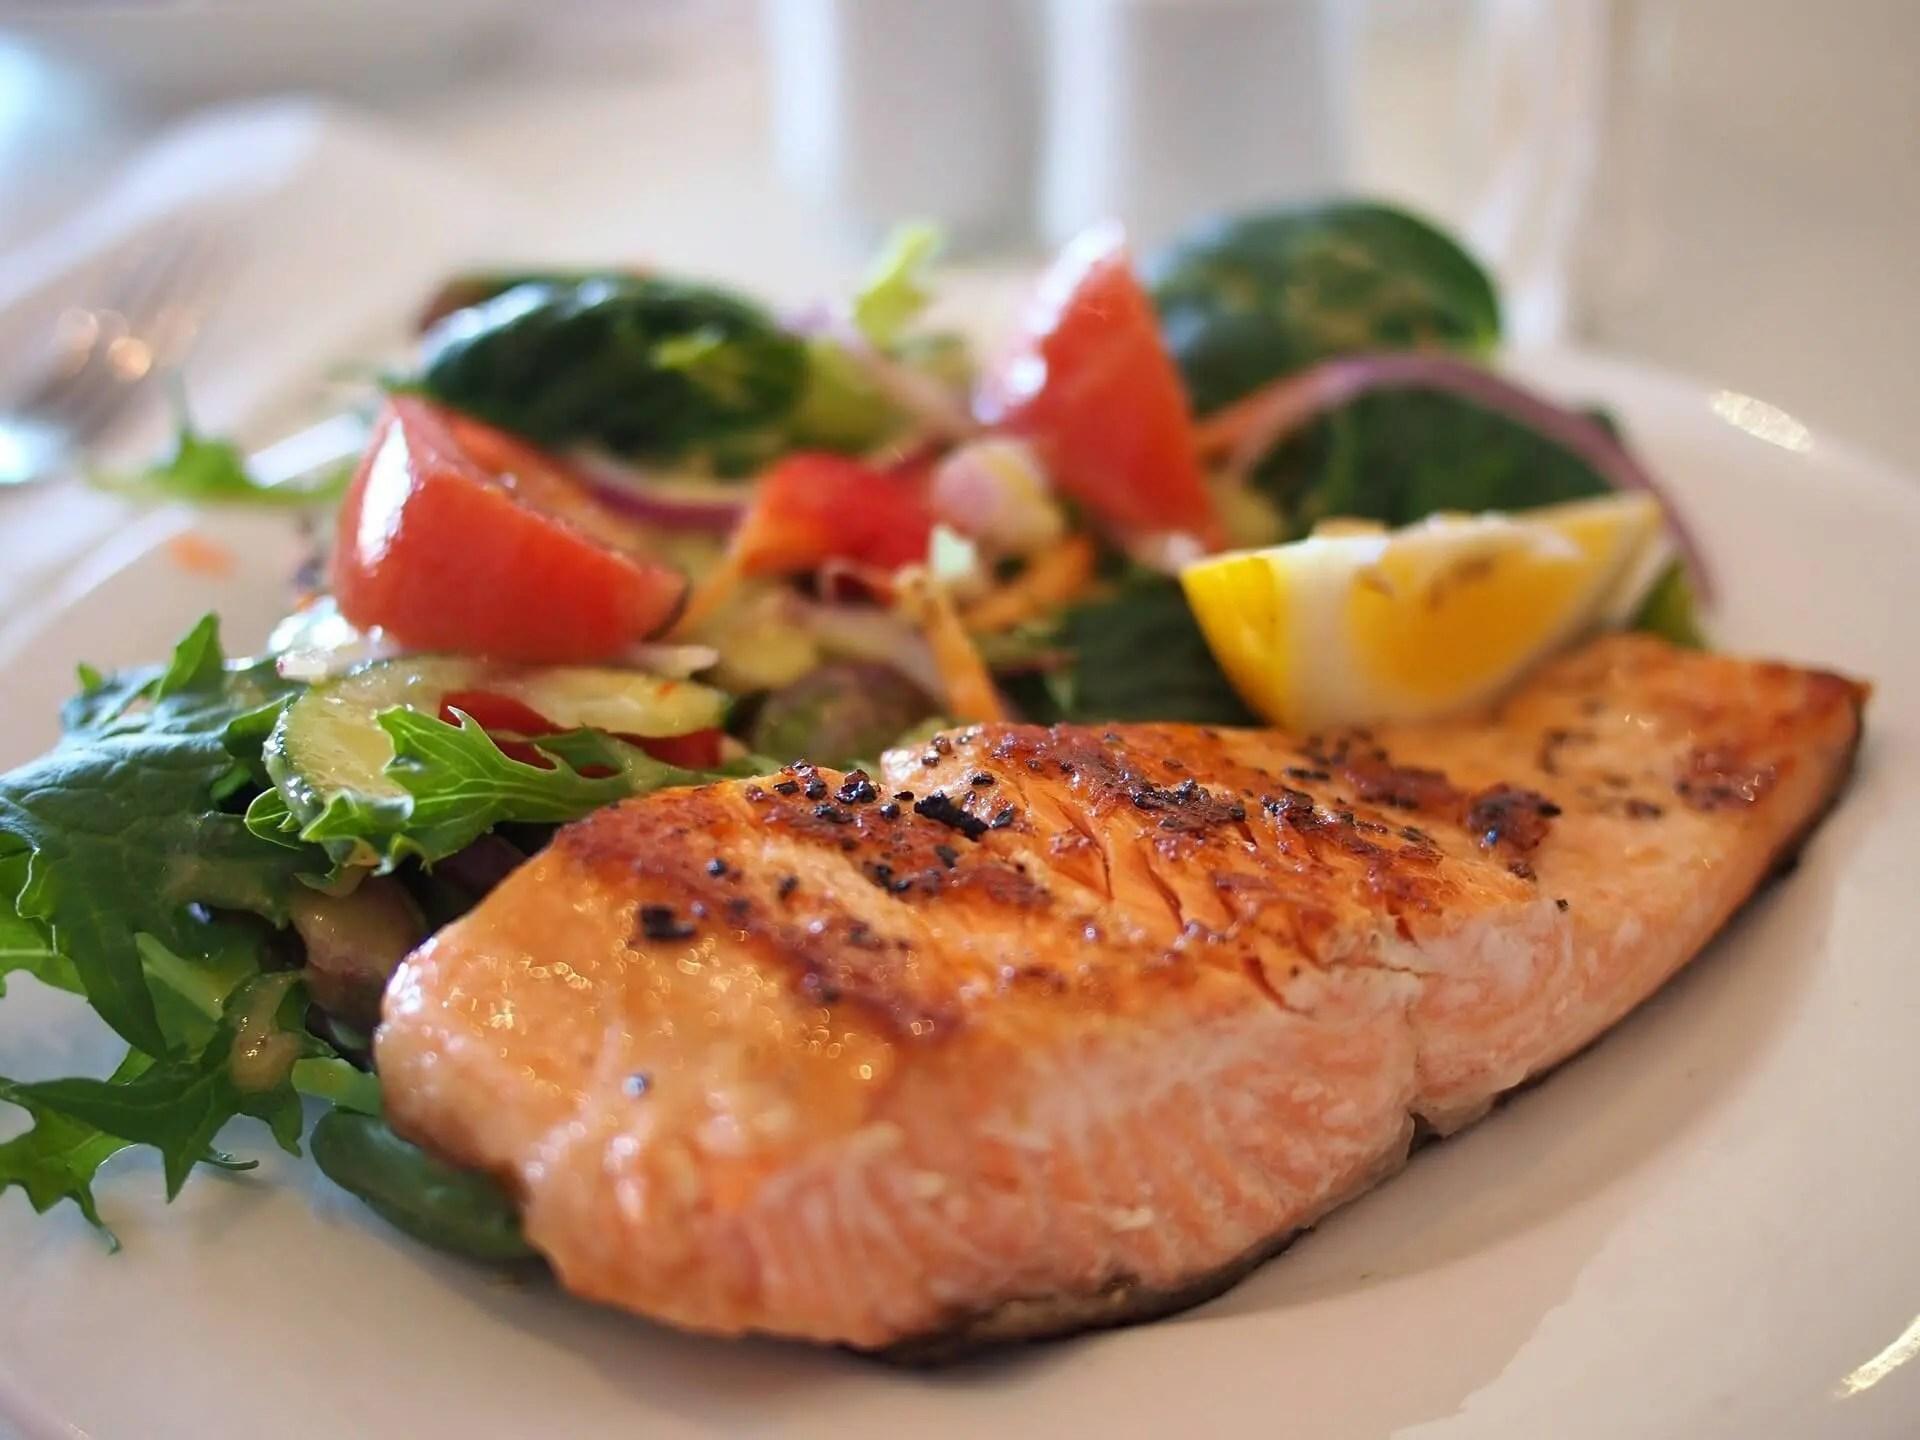 Mood-boosting food - salmon